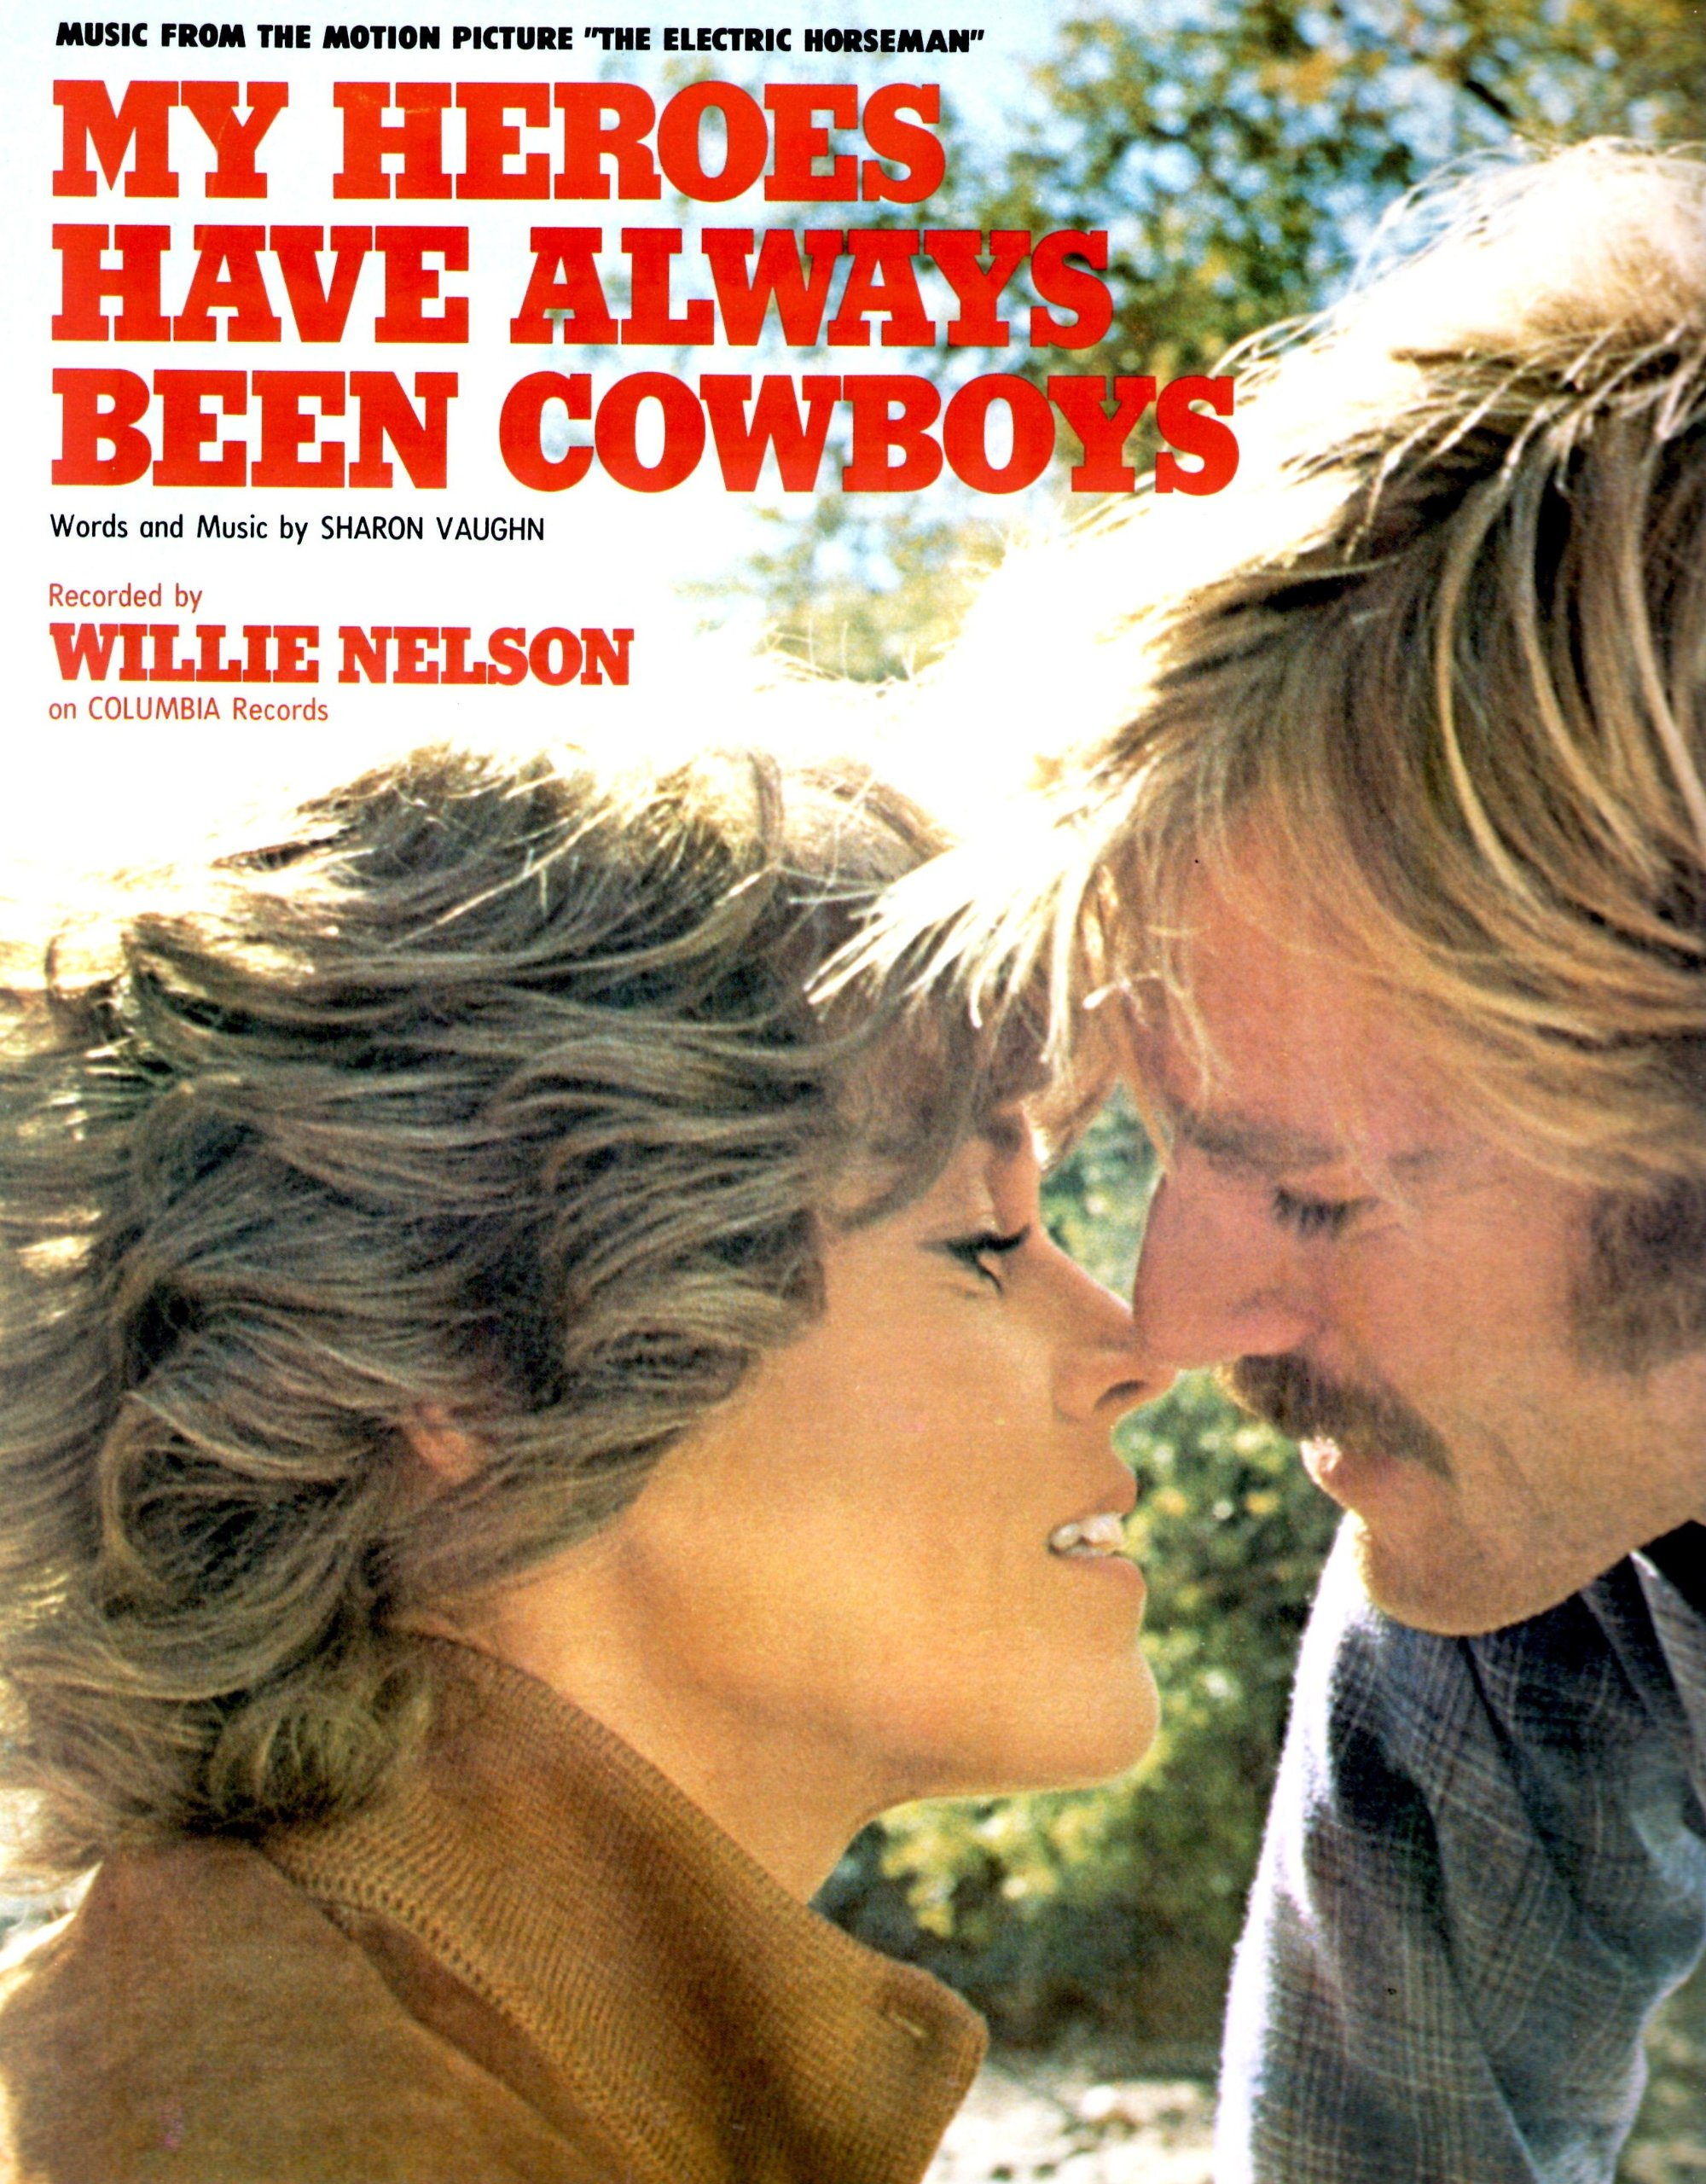 Robert Redford And Jane Fonda The Electric Horseman Movie Sheet Music Sharon Vaughn Amazon Com Books